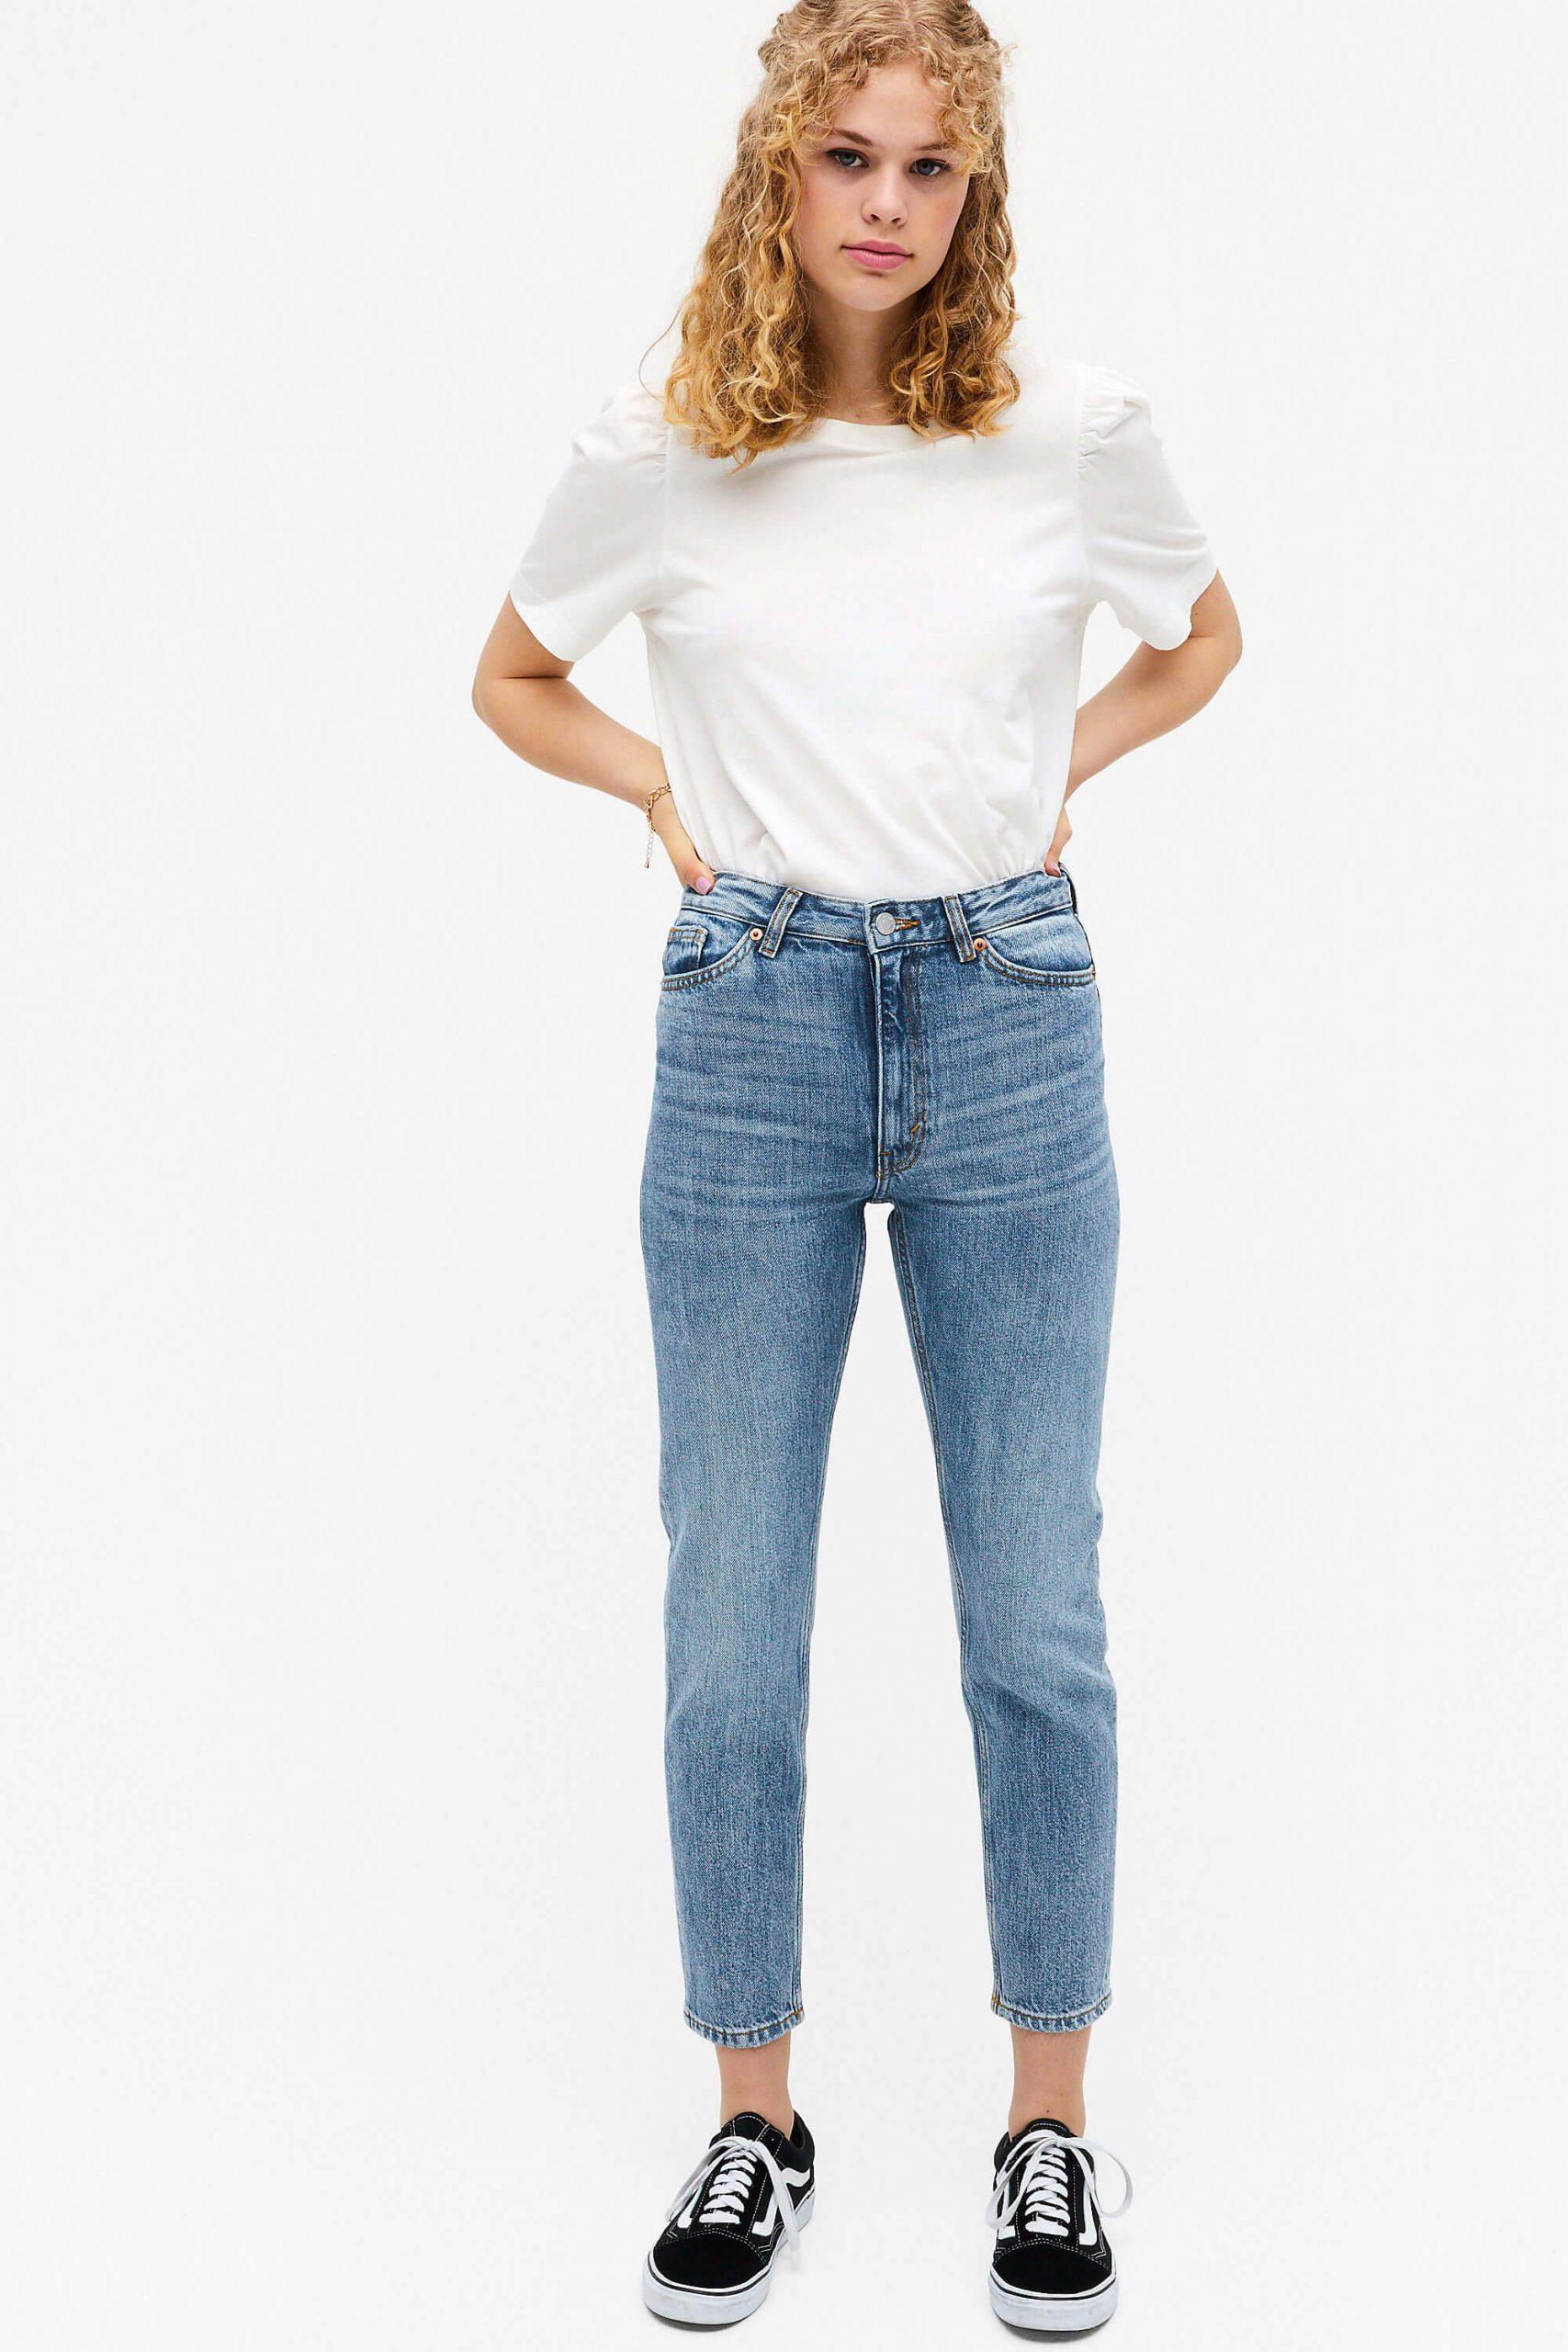 Högmidjade korta jeans